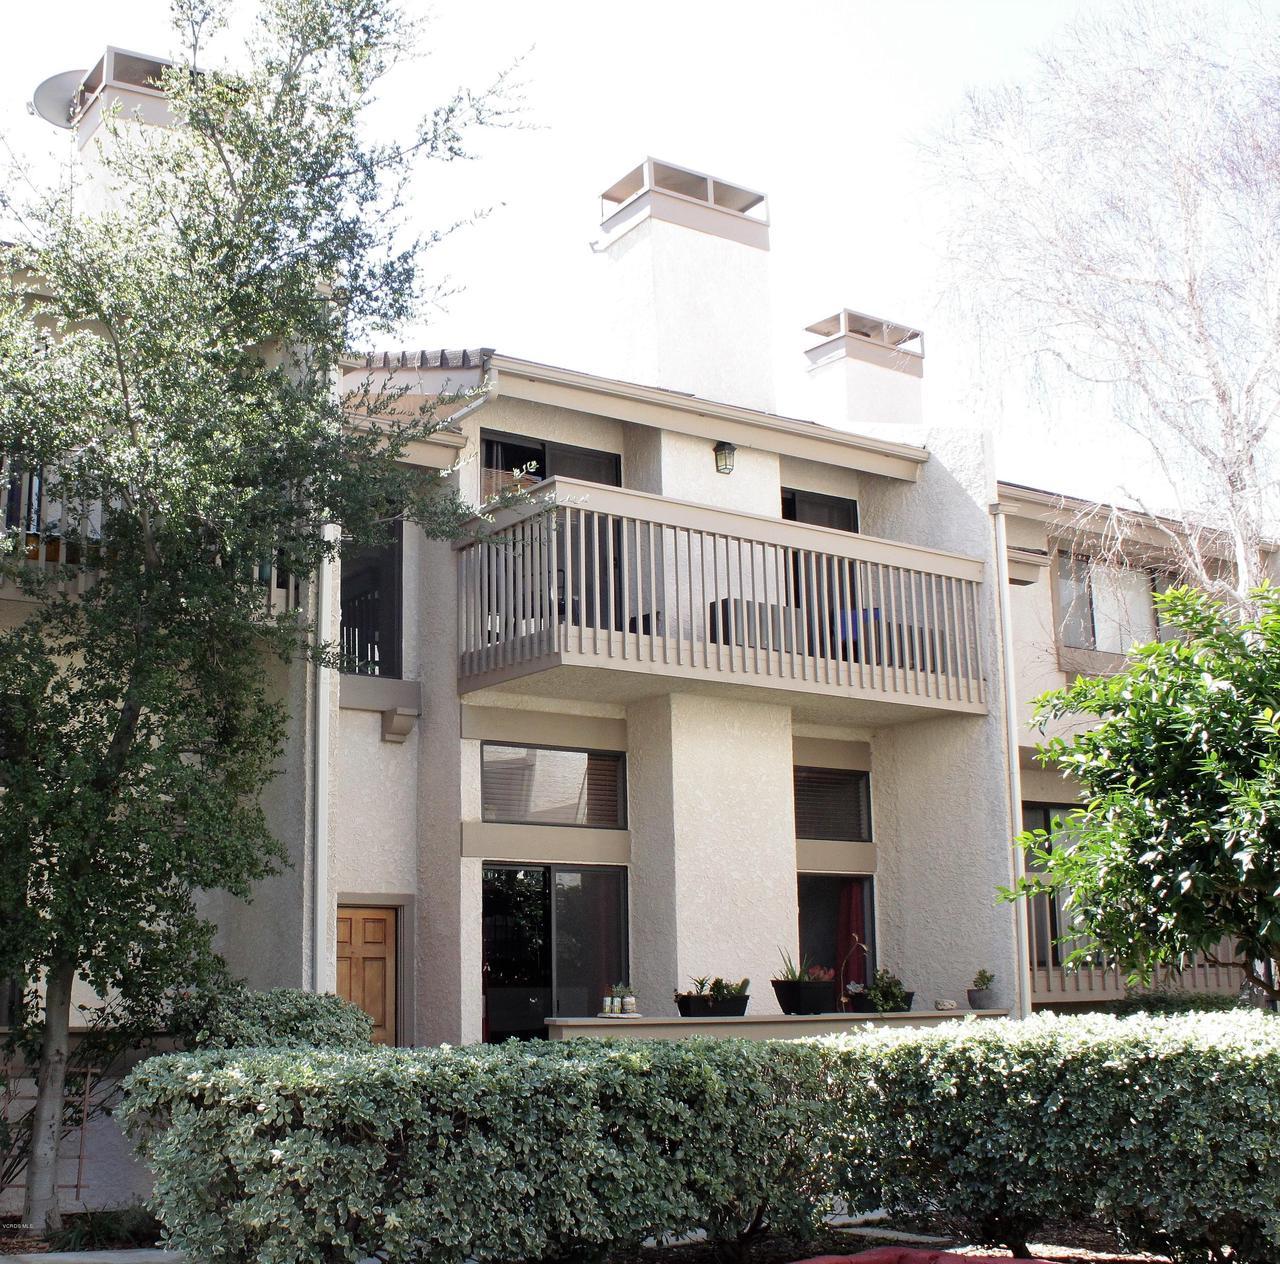 26006 ALIZIA CANYON, Calabasas, CA 91302 - IMG_3799 (2)